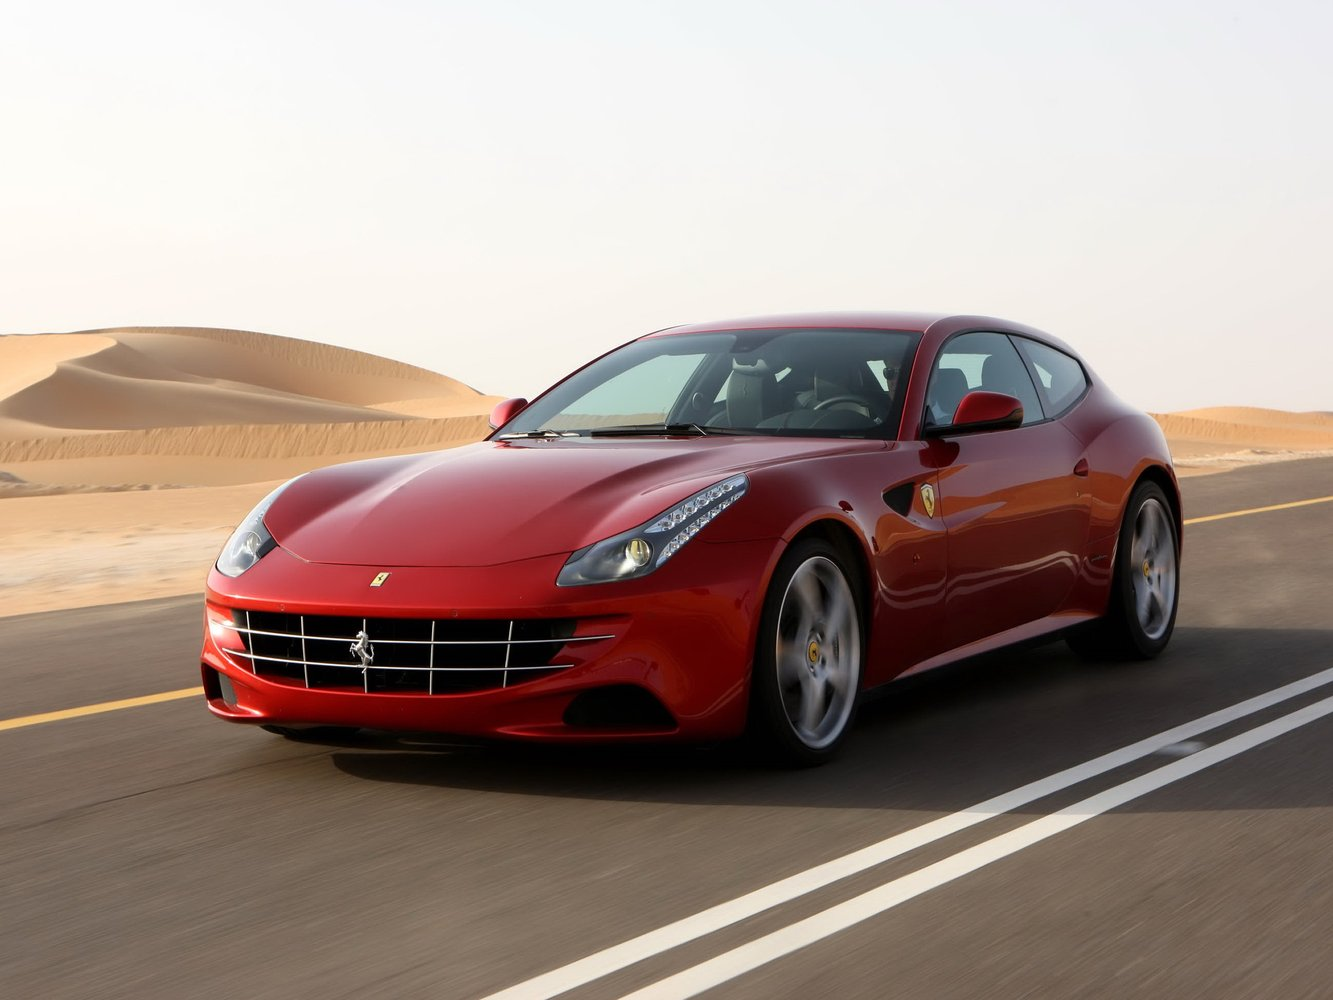 ferrari Ferrari FF